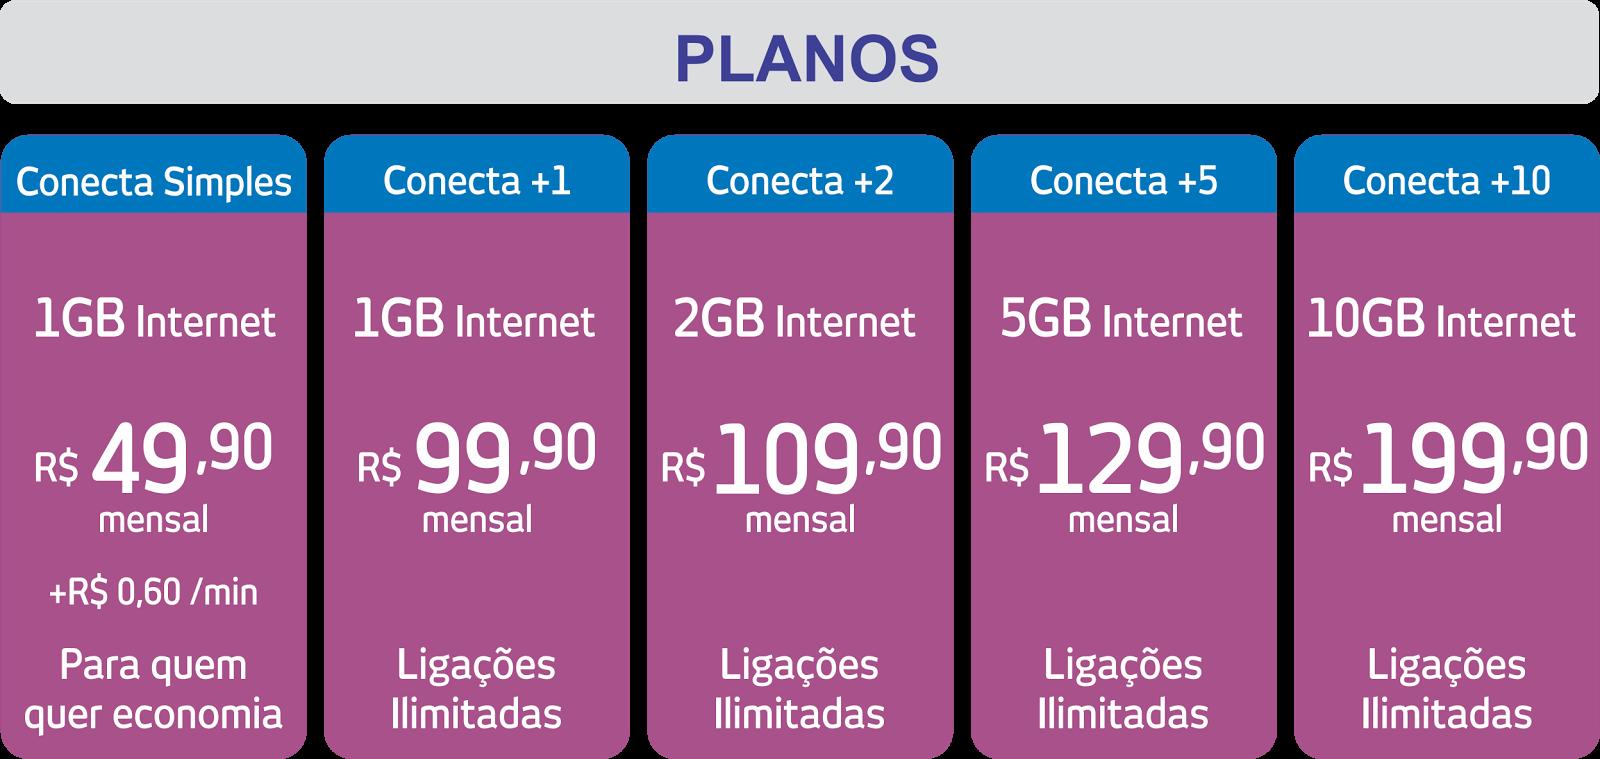 PREÇOS E PRODUTOS DA PORTO SEGURO CONECTA